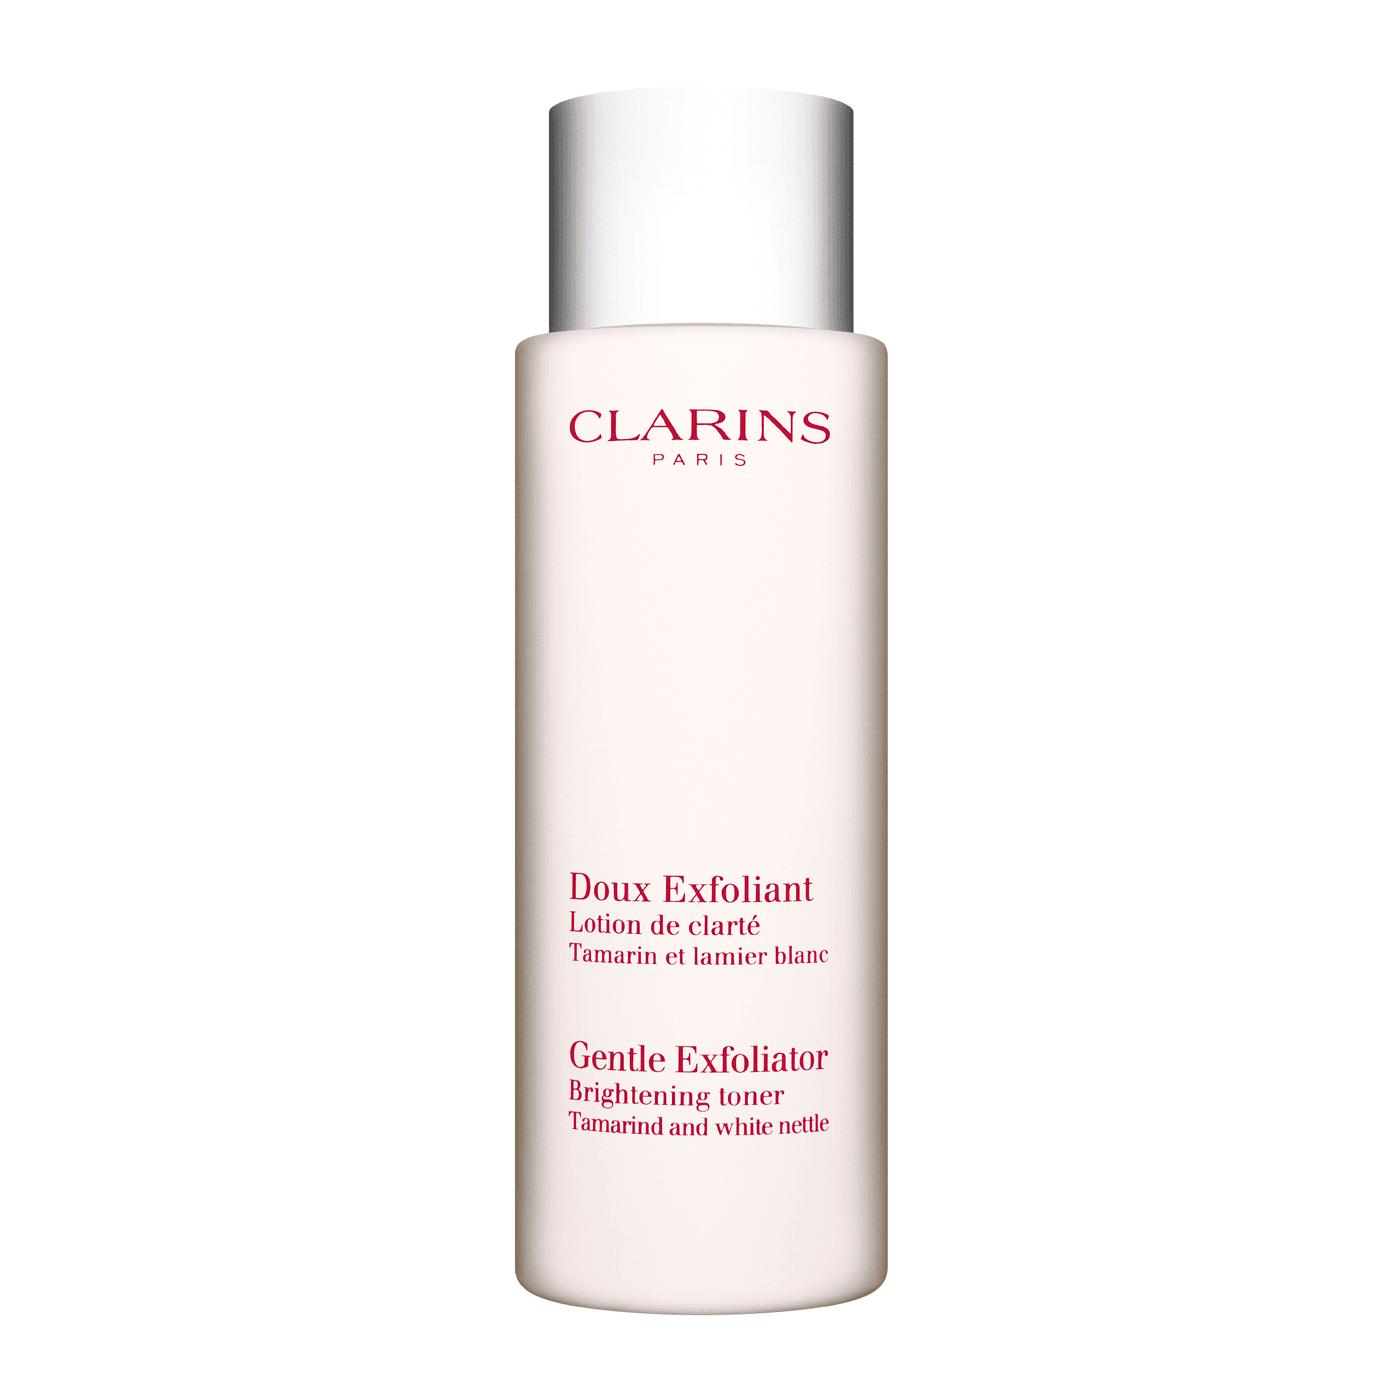 Clarins Gentle Exfoliator